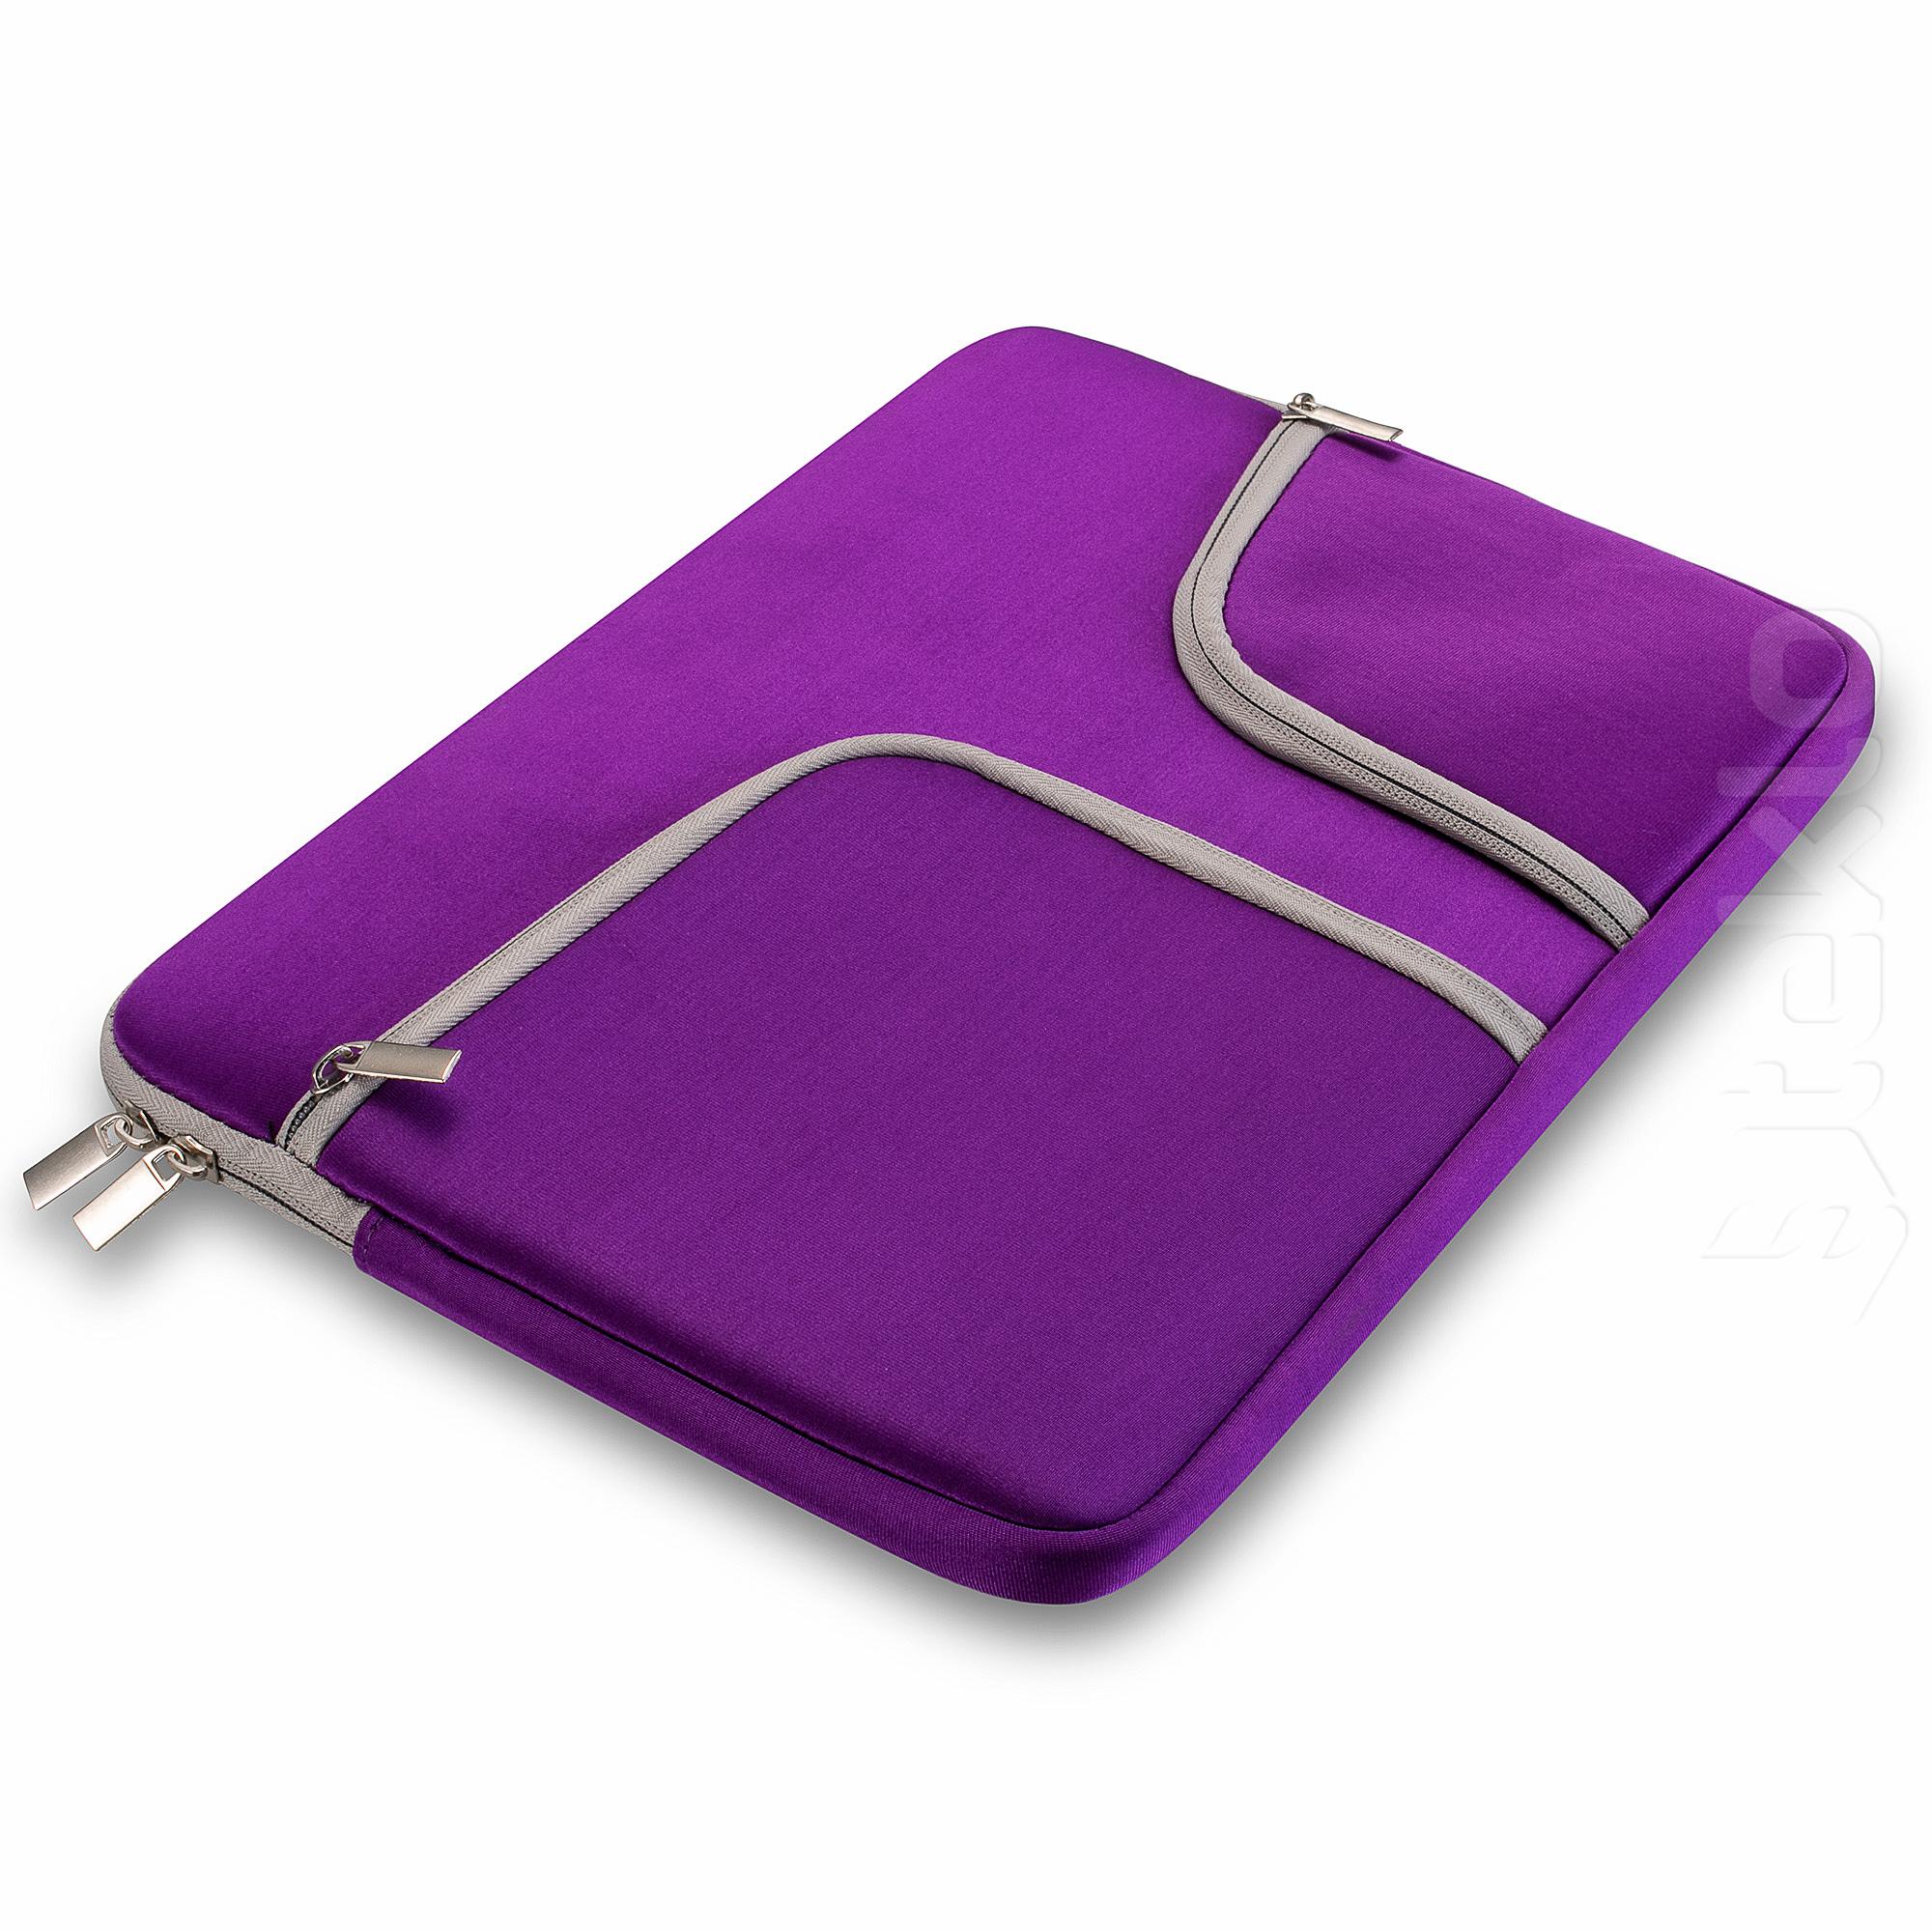 neoprene sleeve case for macbook pro retina air 11 12 13 15 inch laptop 13 3. Black Bedroom Furniture Sets. Home Design Ideas